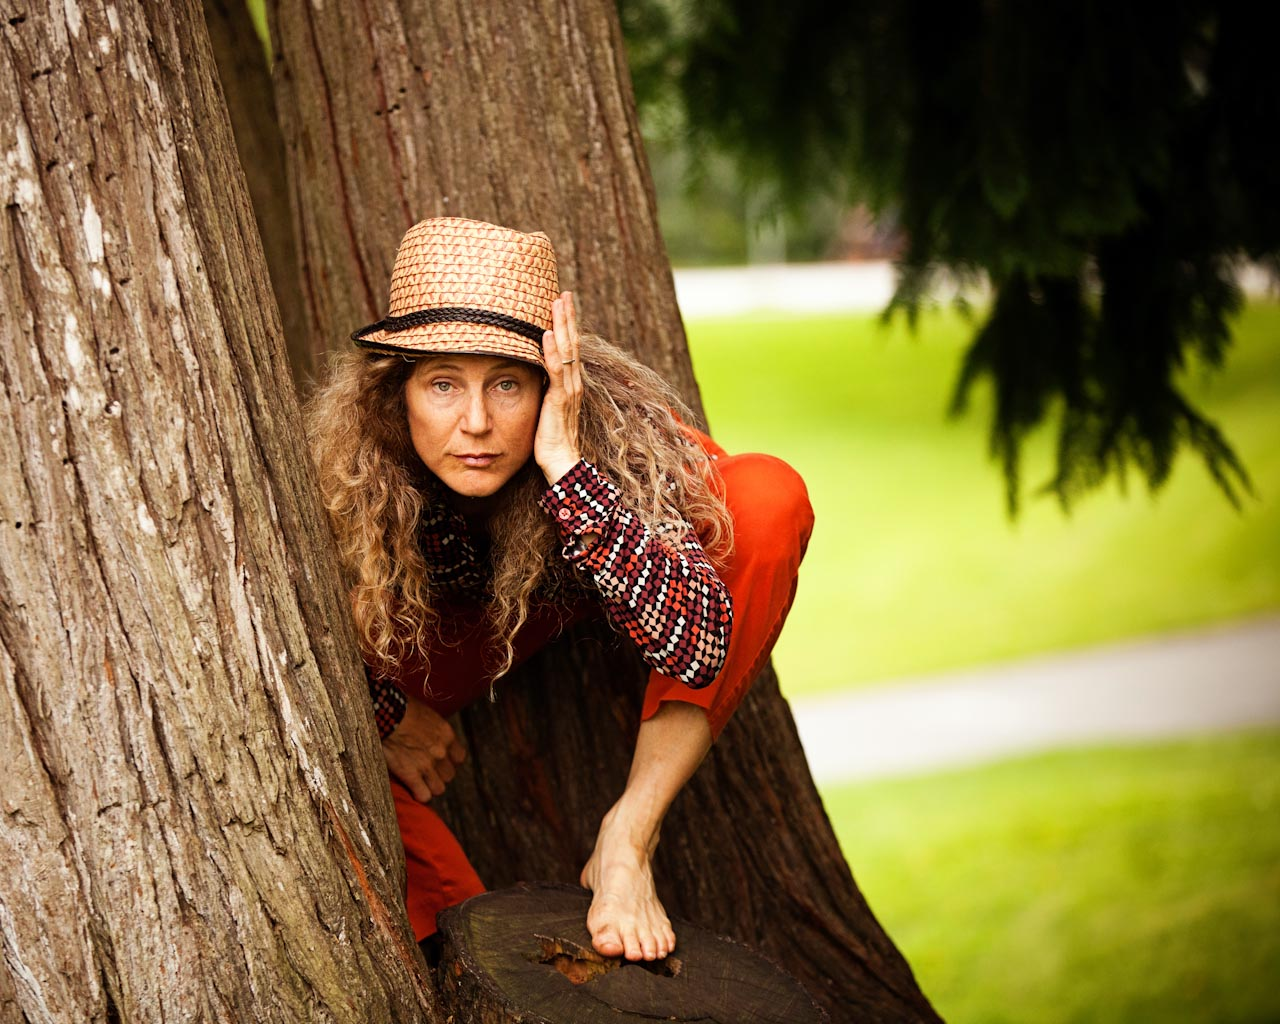 Kim Epifano, photo by Gregory Bartning